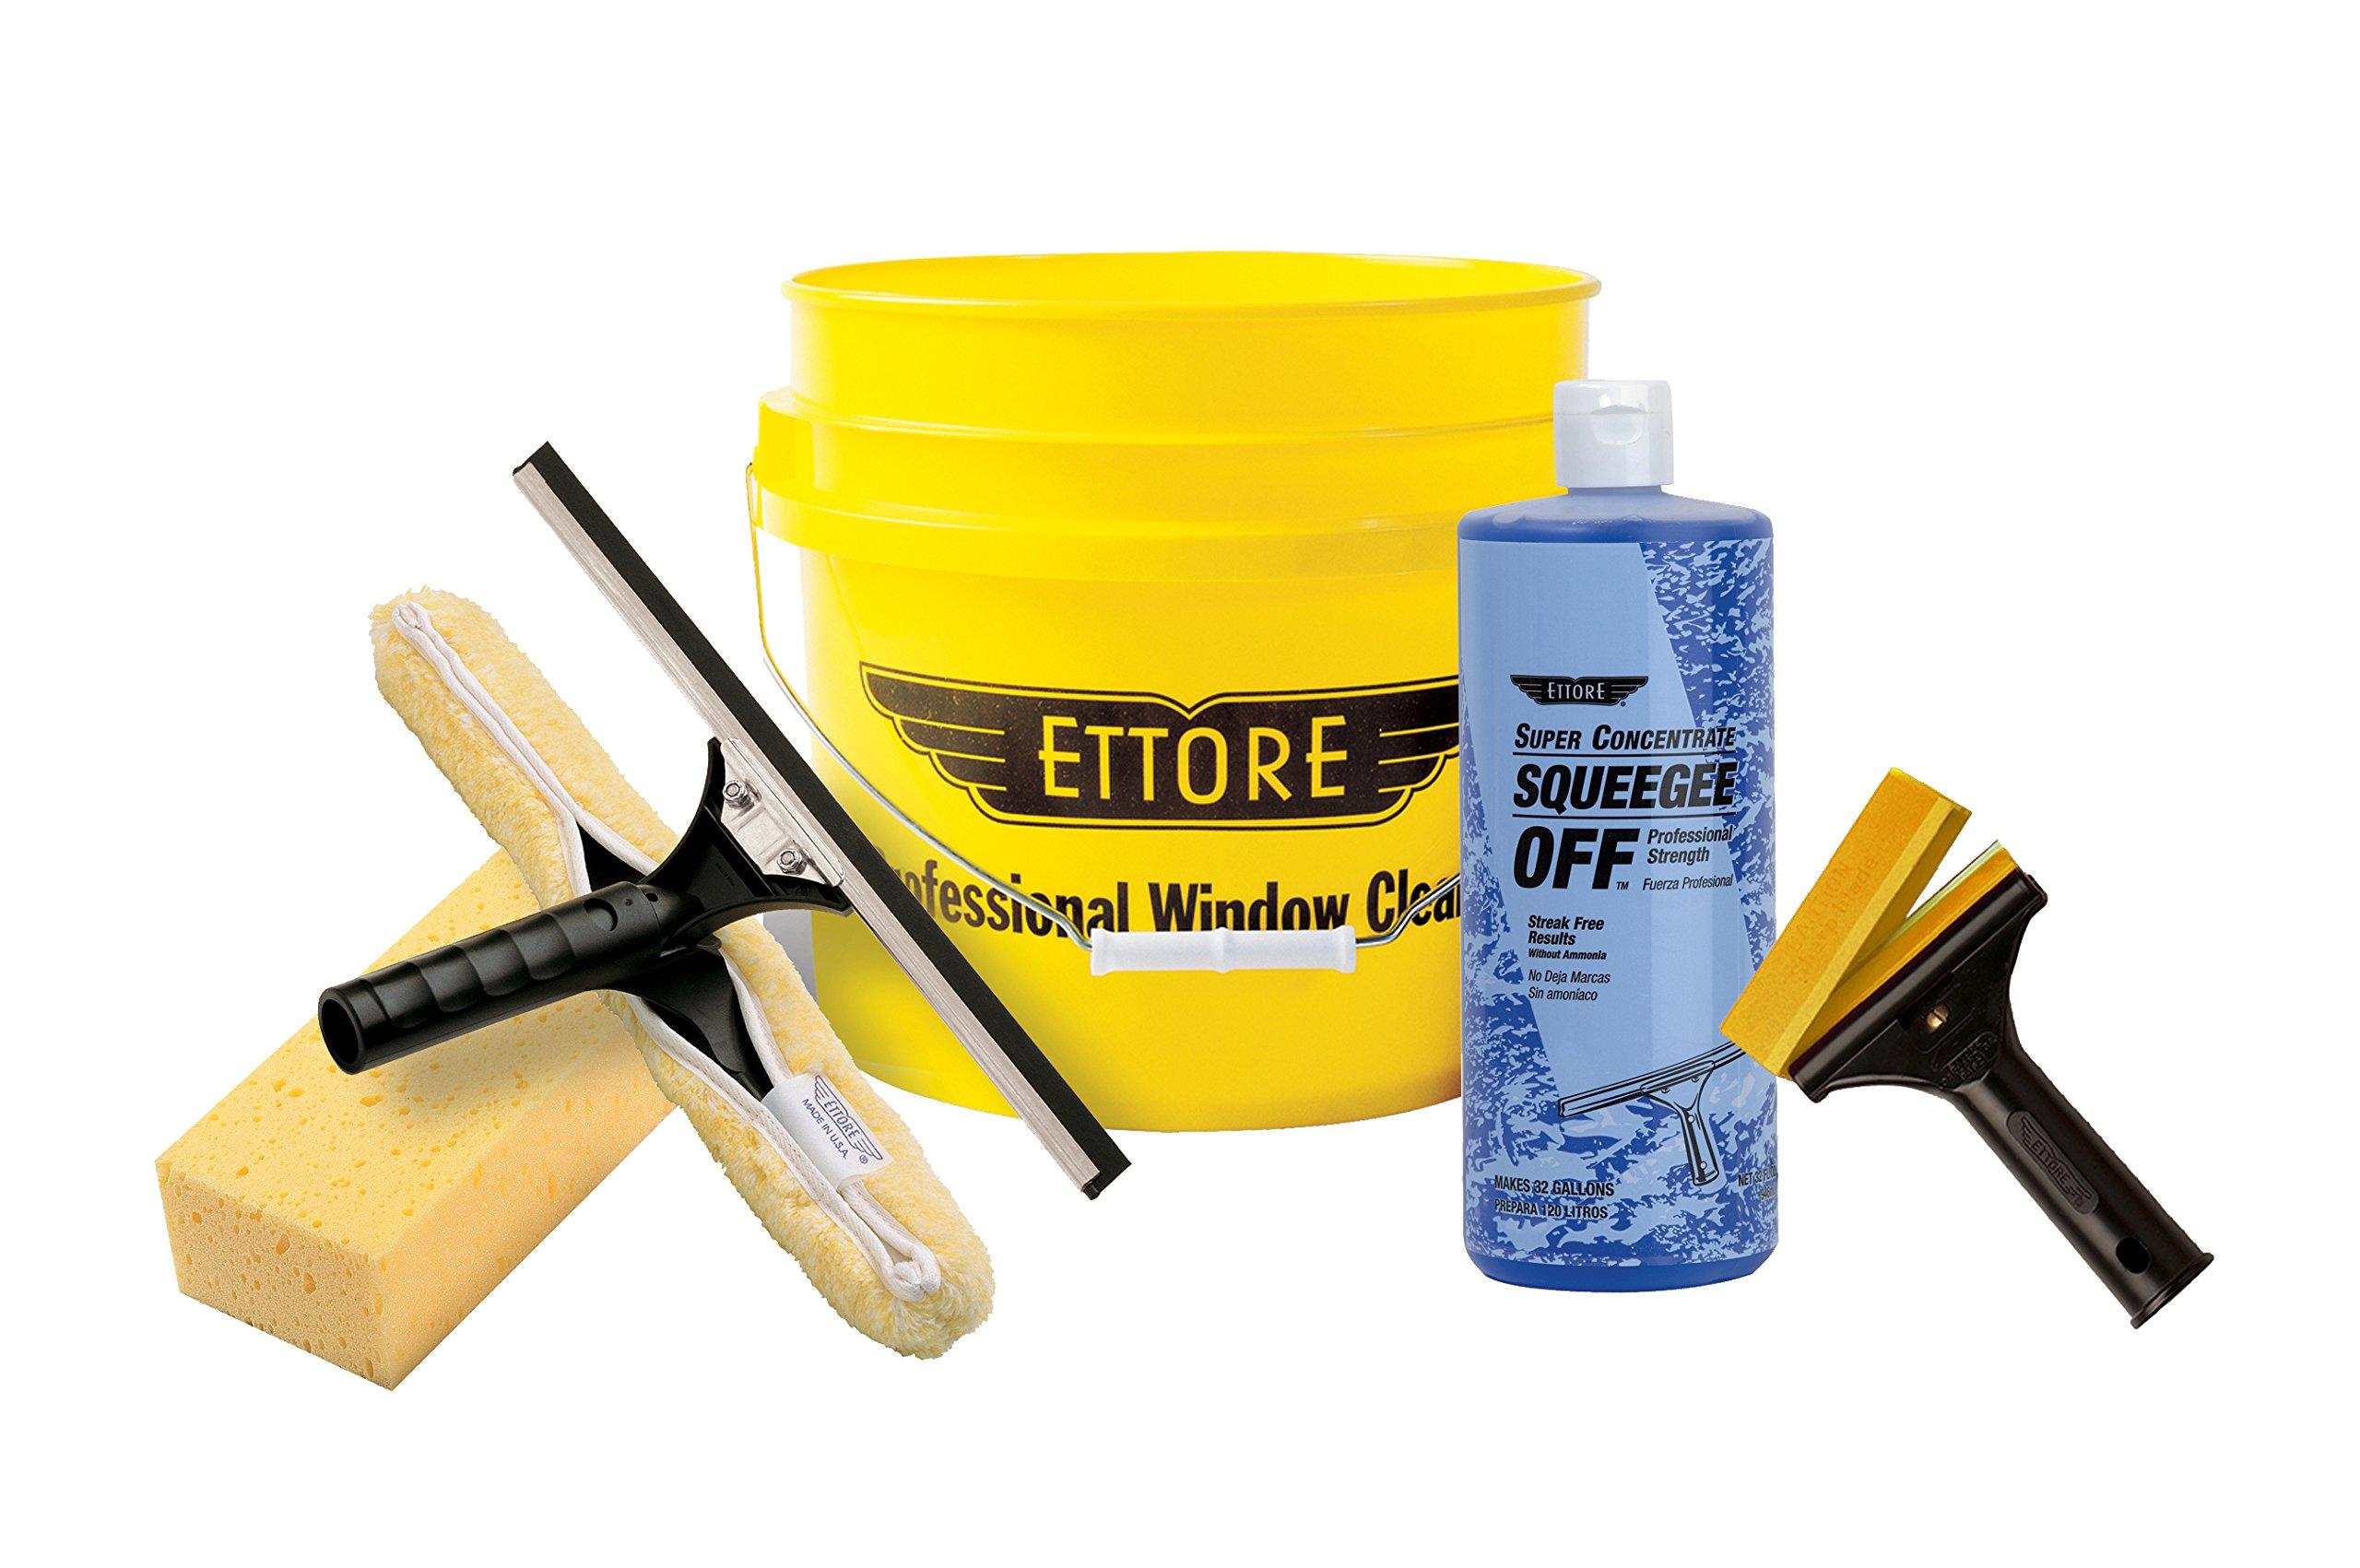 Ettore 85555 Window Cleaning Kit